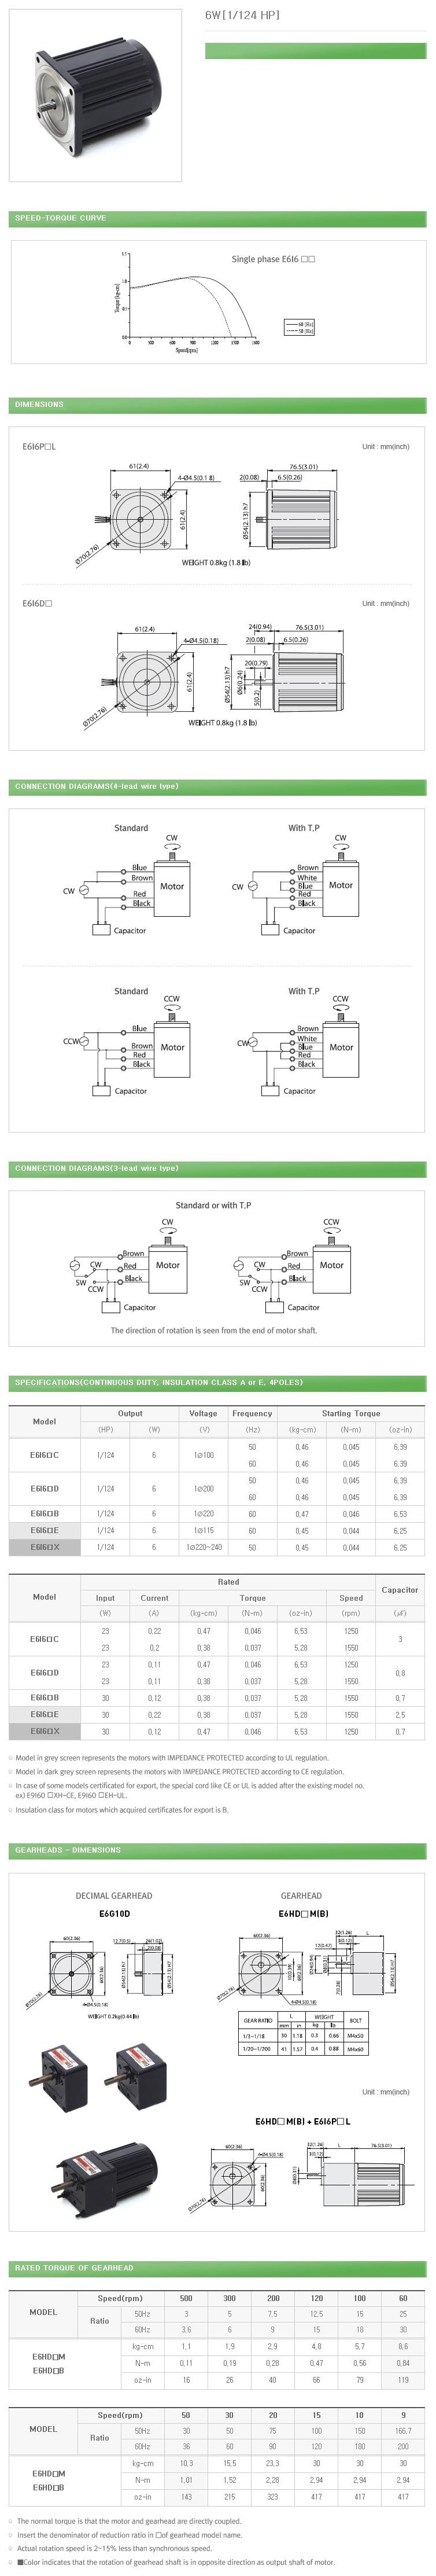 DAEHWA E/M Induction Motor (6W, 1/124 HP)